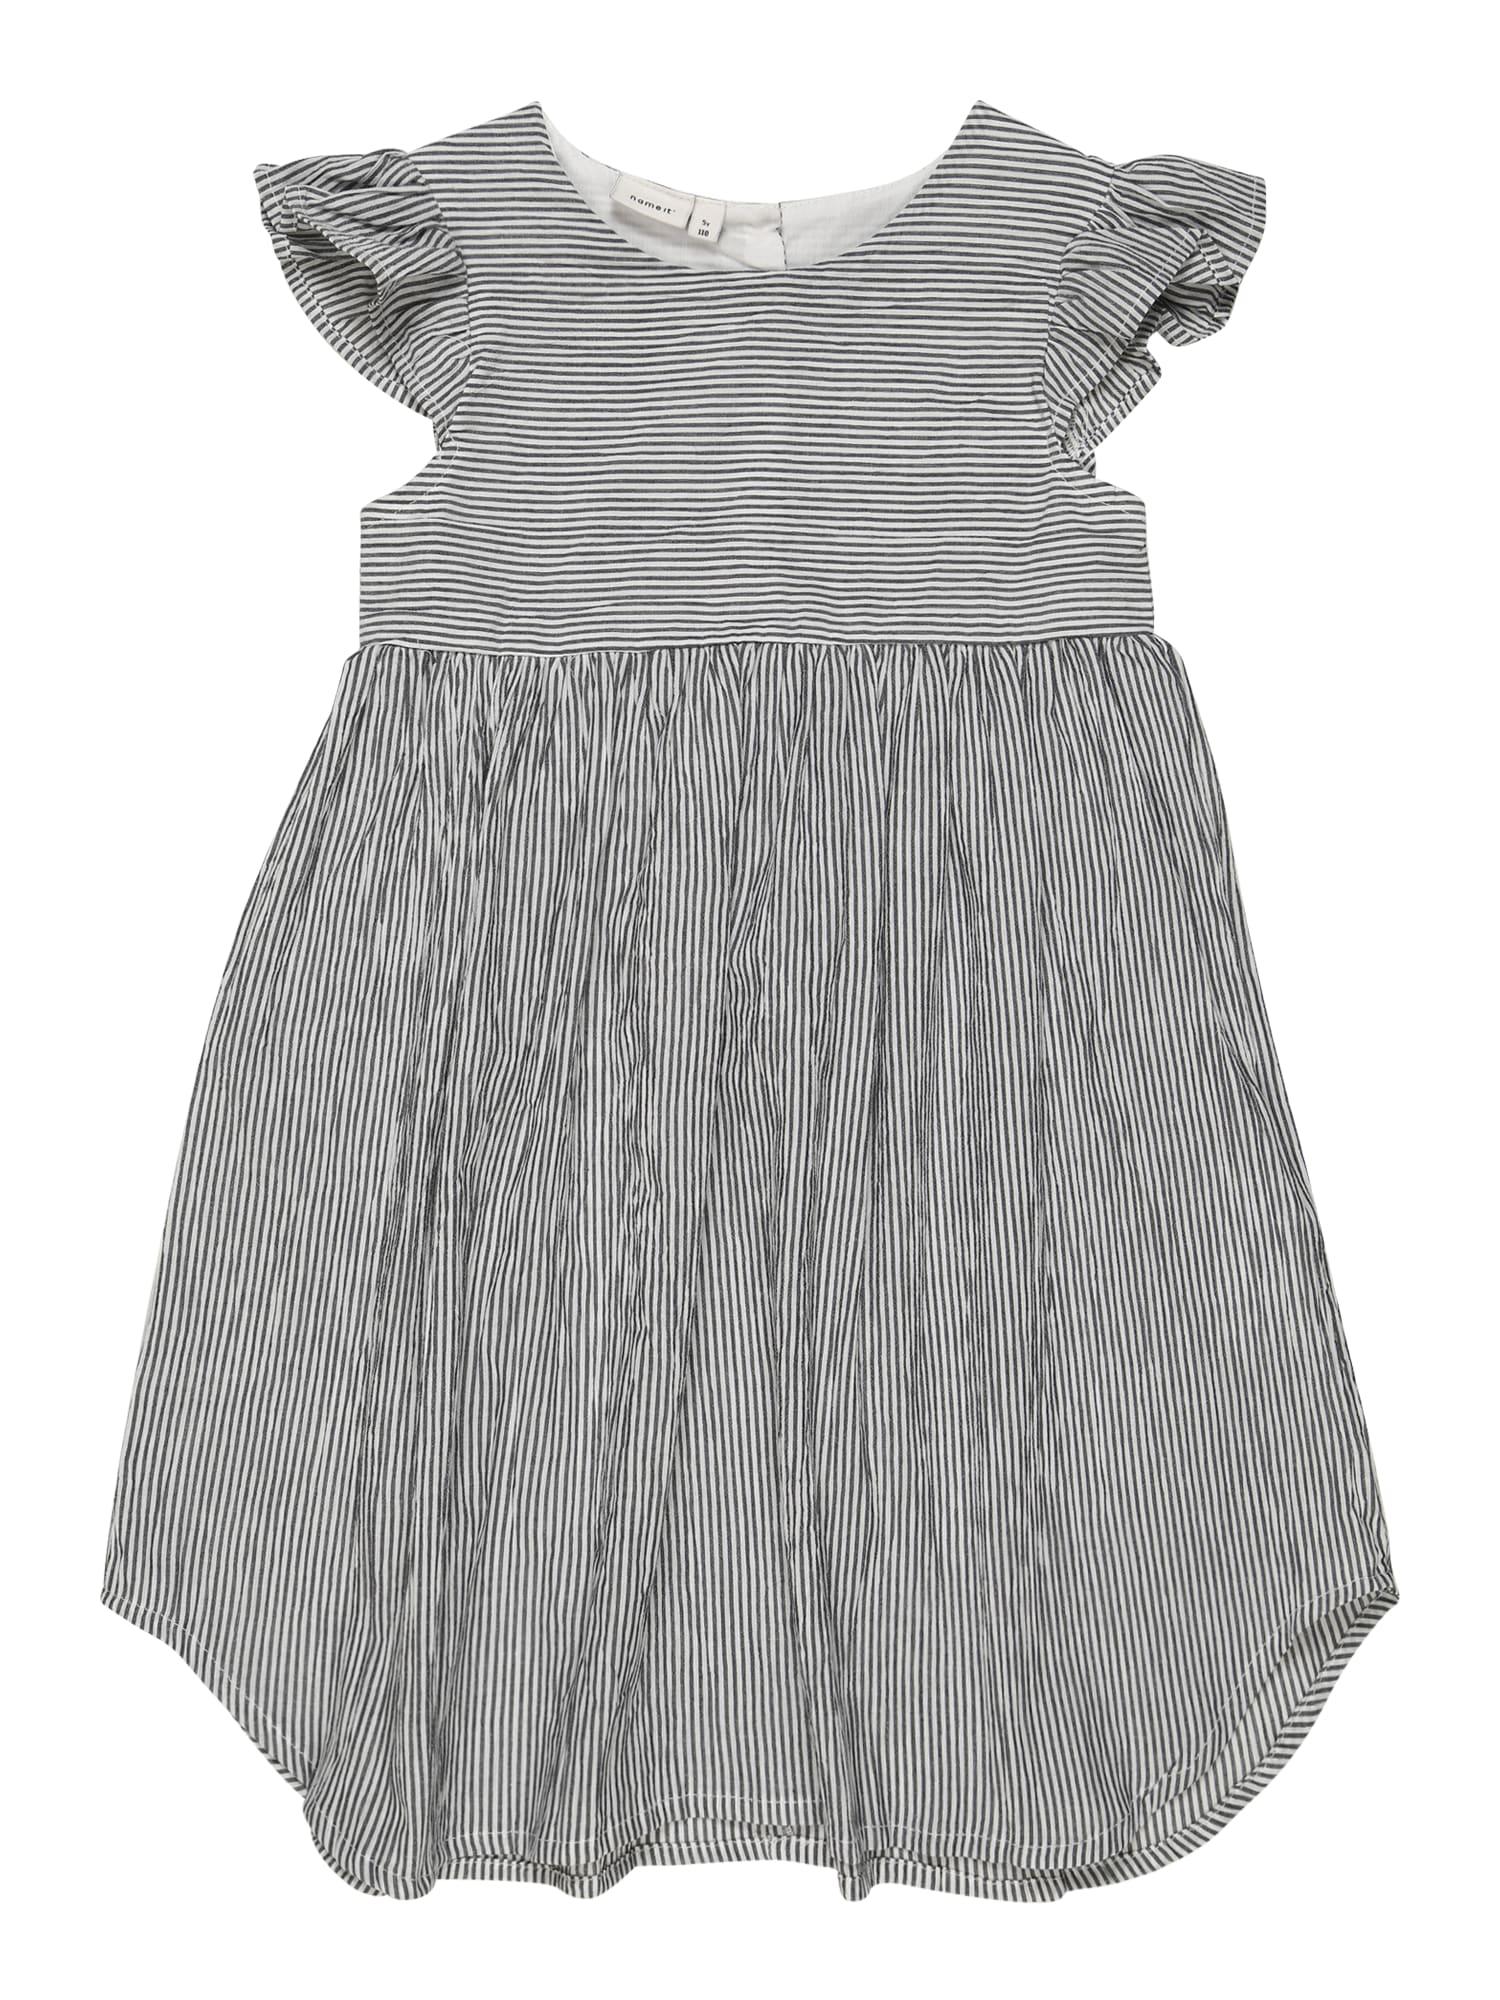 NAME IT Suknelė balta / ultramarino mėlyna (skaidri)